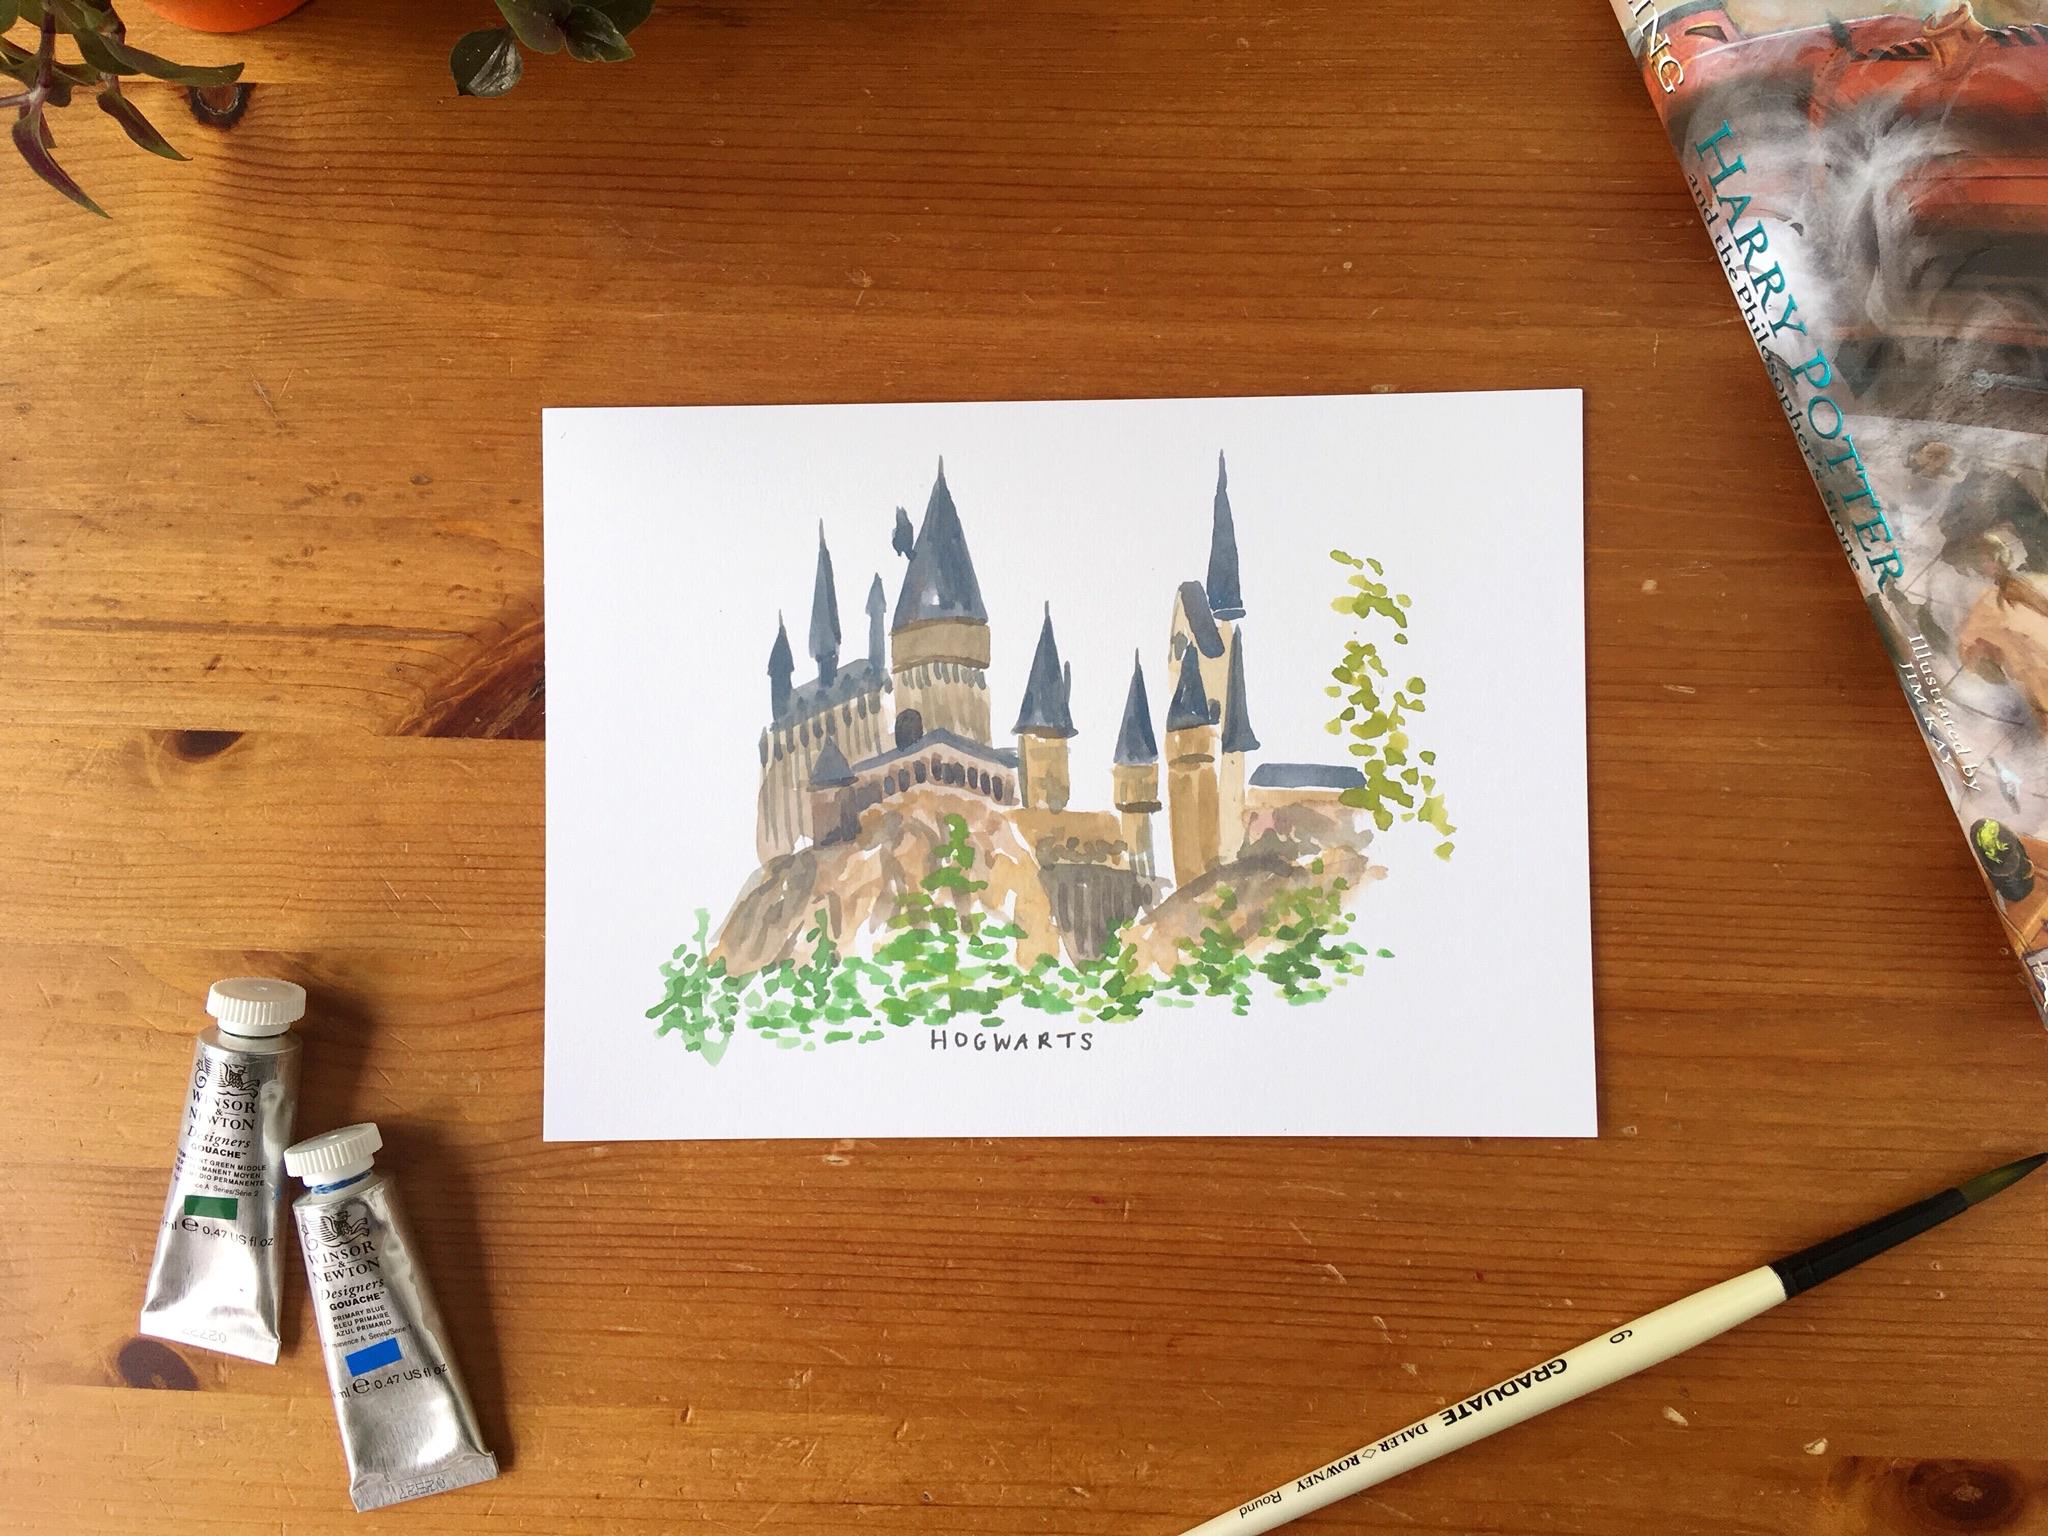 hogwarts prin - Zoeprose literary house seriest